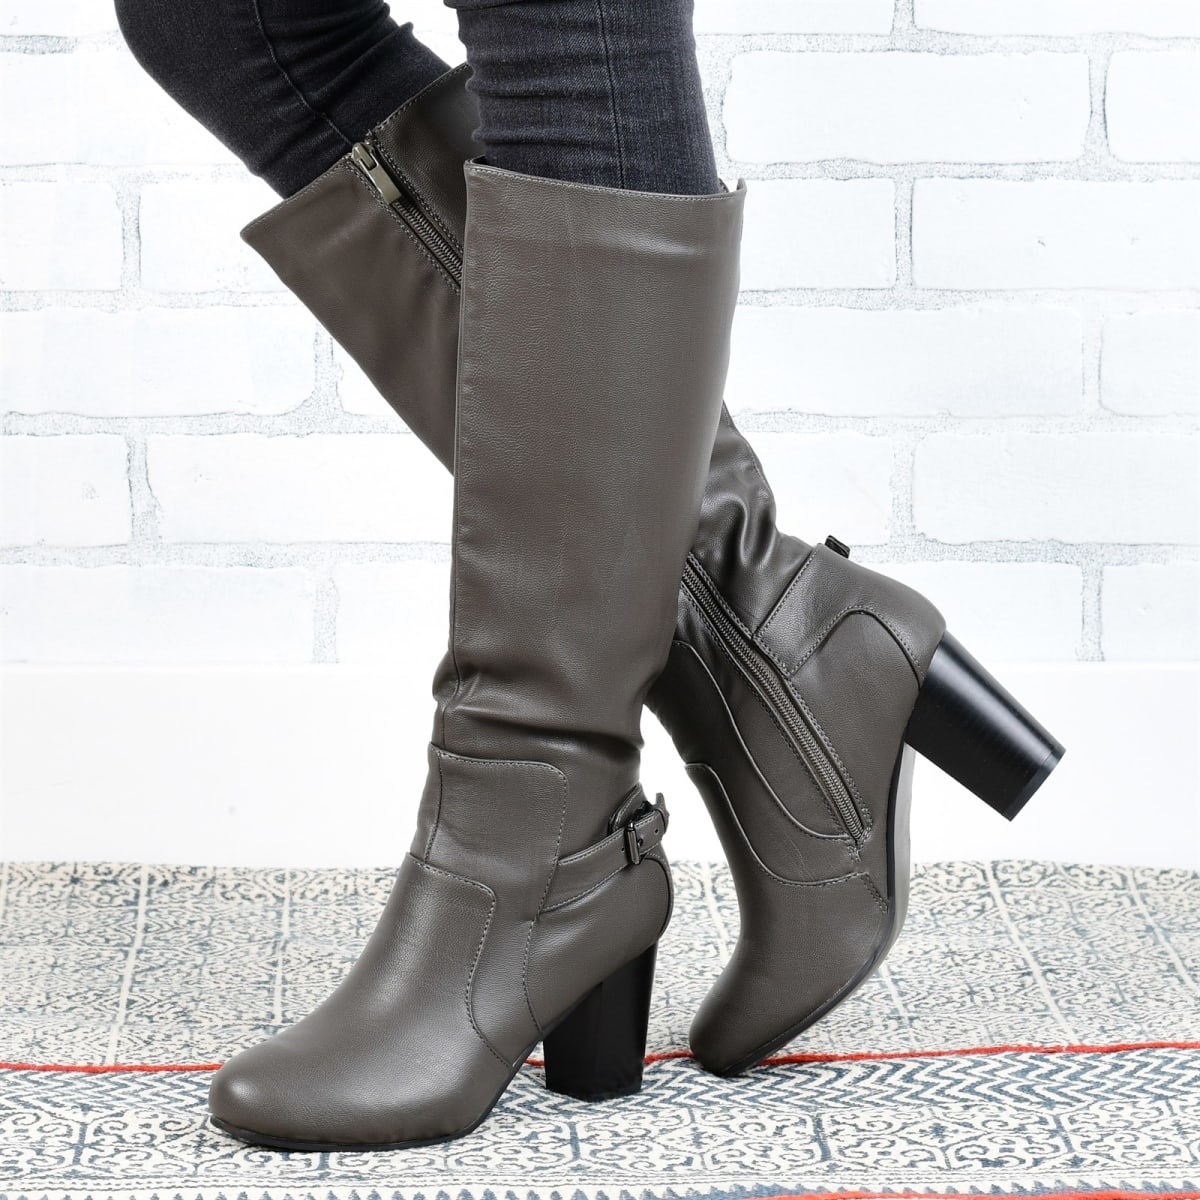 Buckle High-Heeled Boot   Wide Calf Option